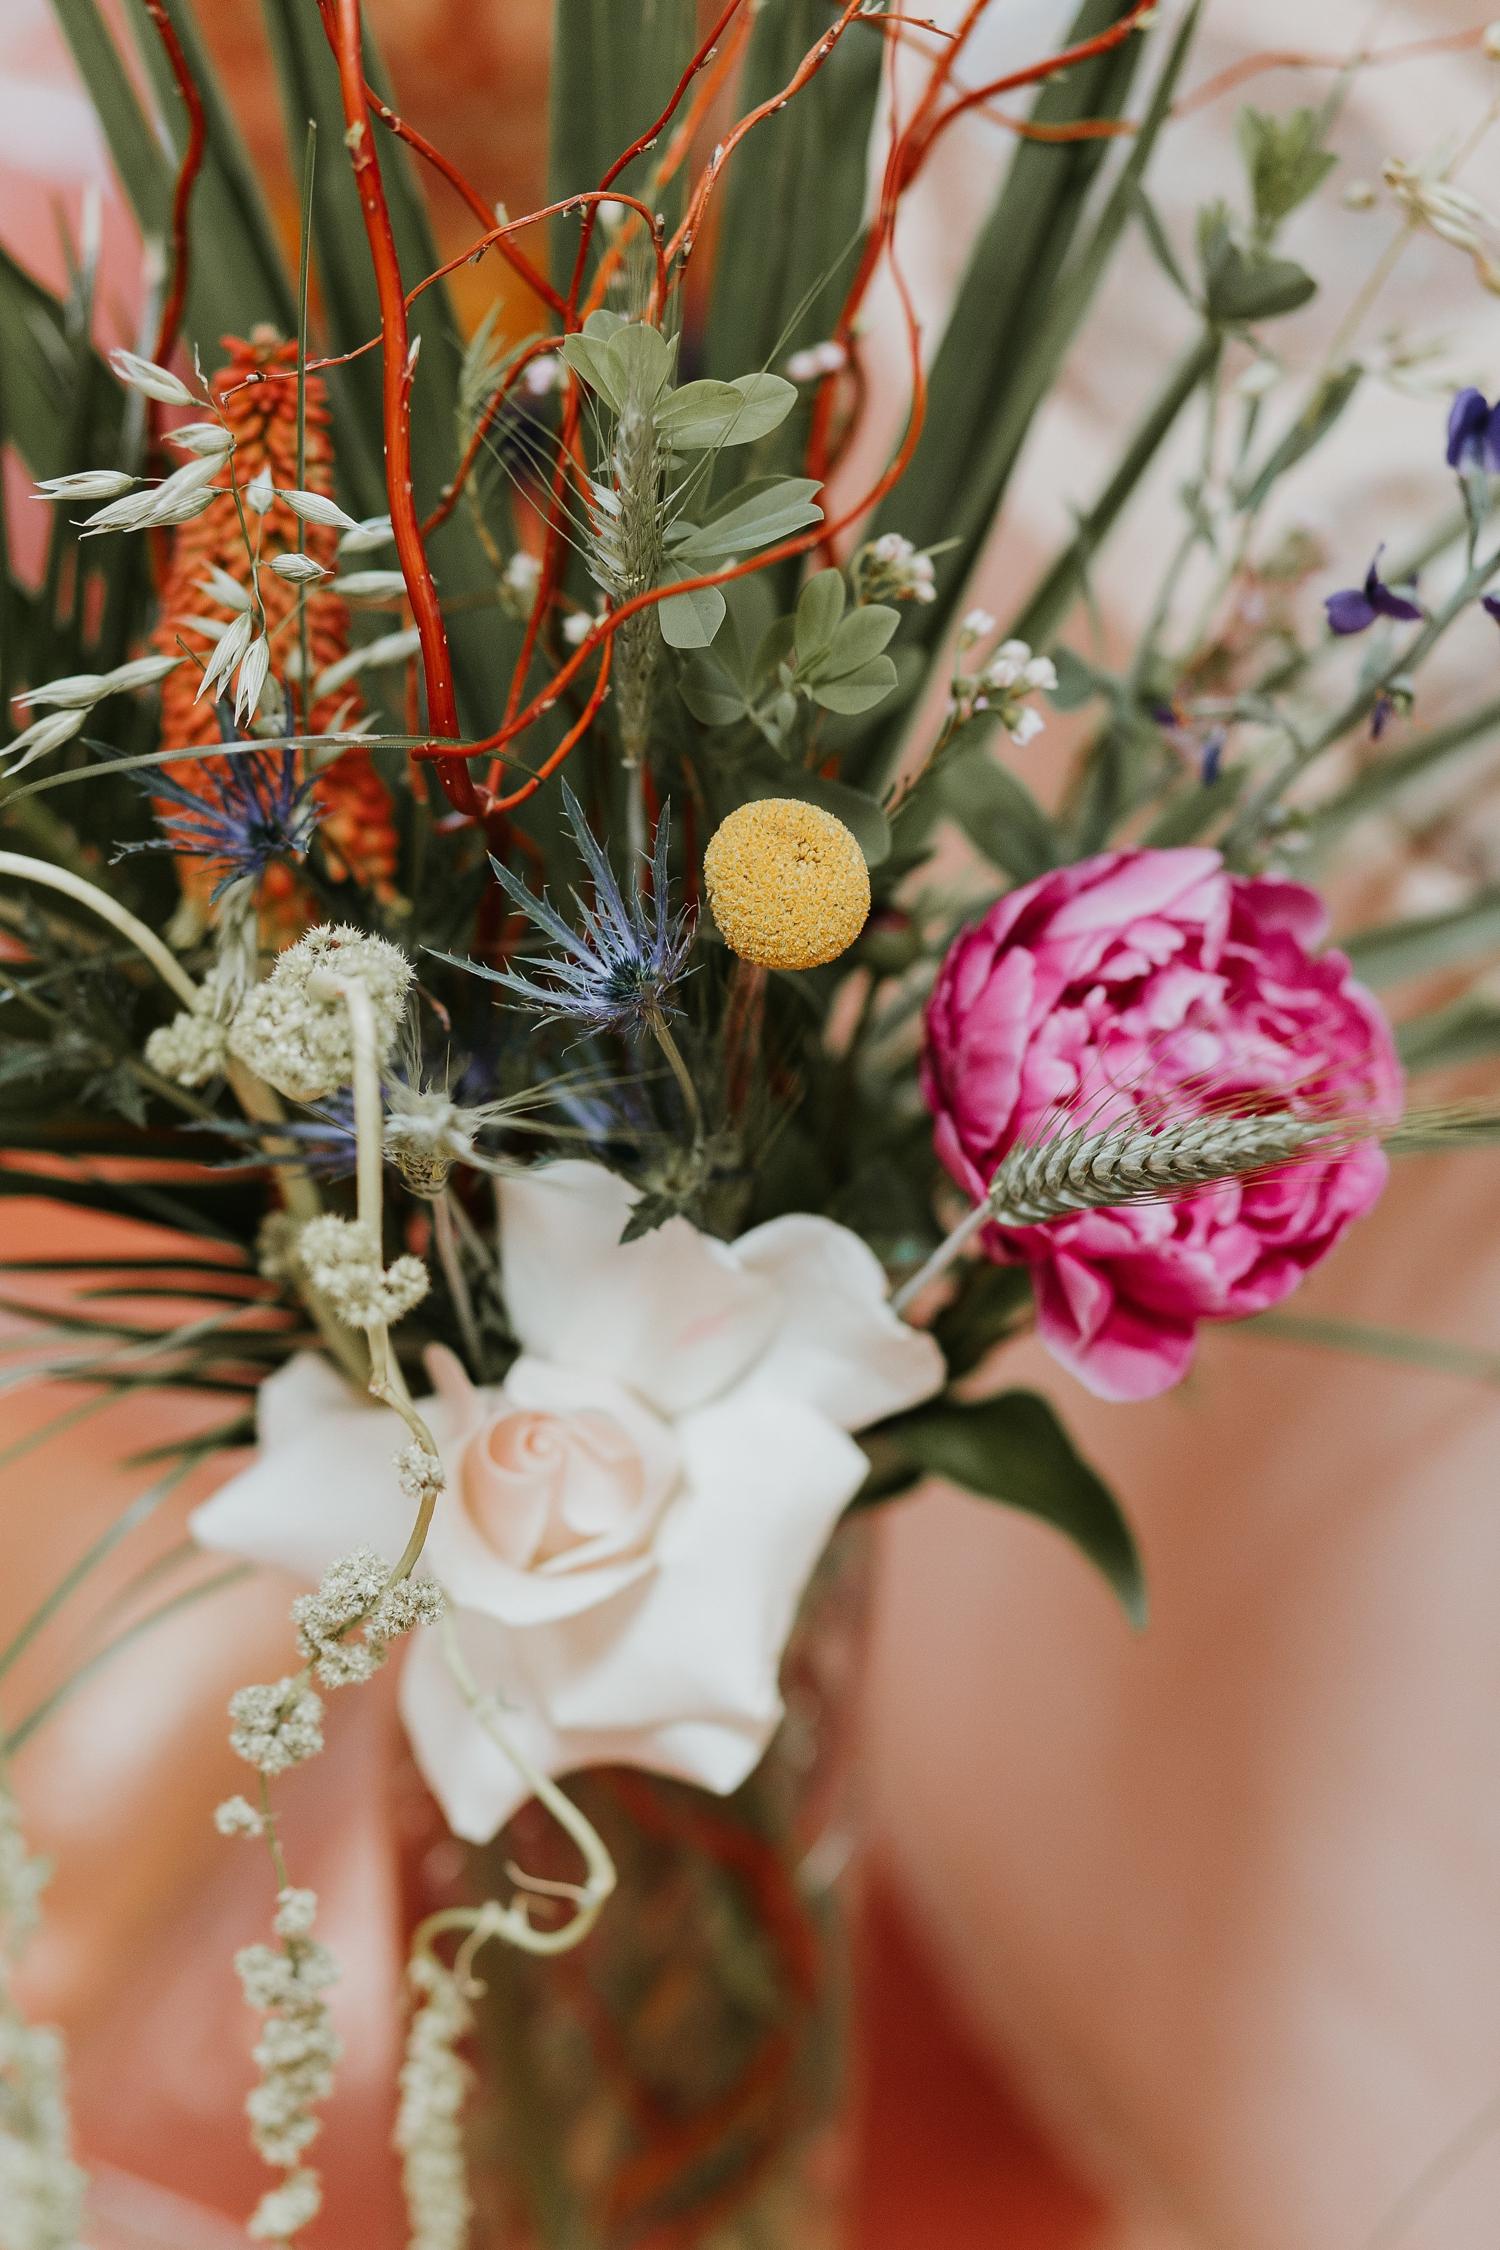 Alicia+lucia+photography+-+albuquerque+wedding+photographer+-+santa+fe+wedding+photography+-+new+mexico+wedding+photographer+-+wedding+flowers+-+summer+wedding+flowers_0026.jpg